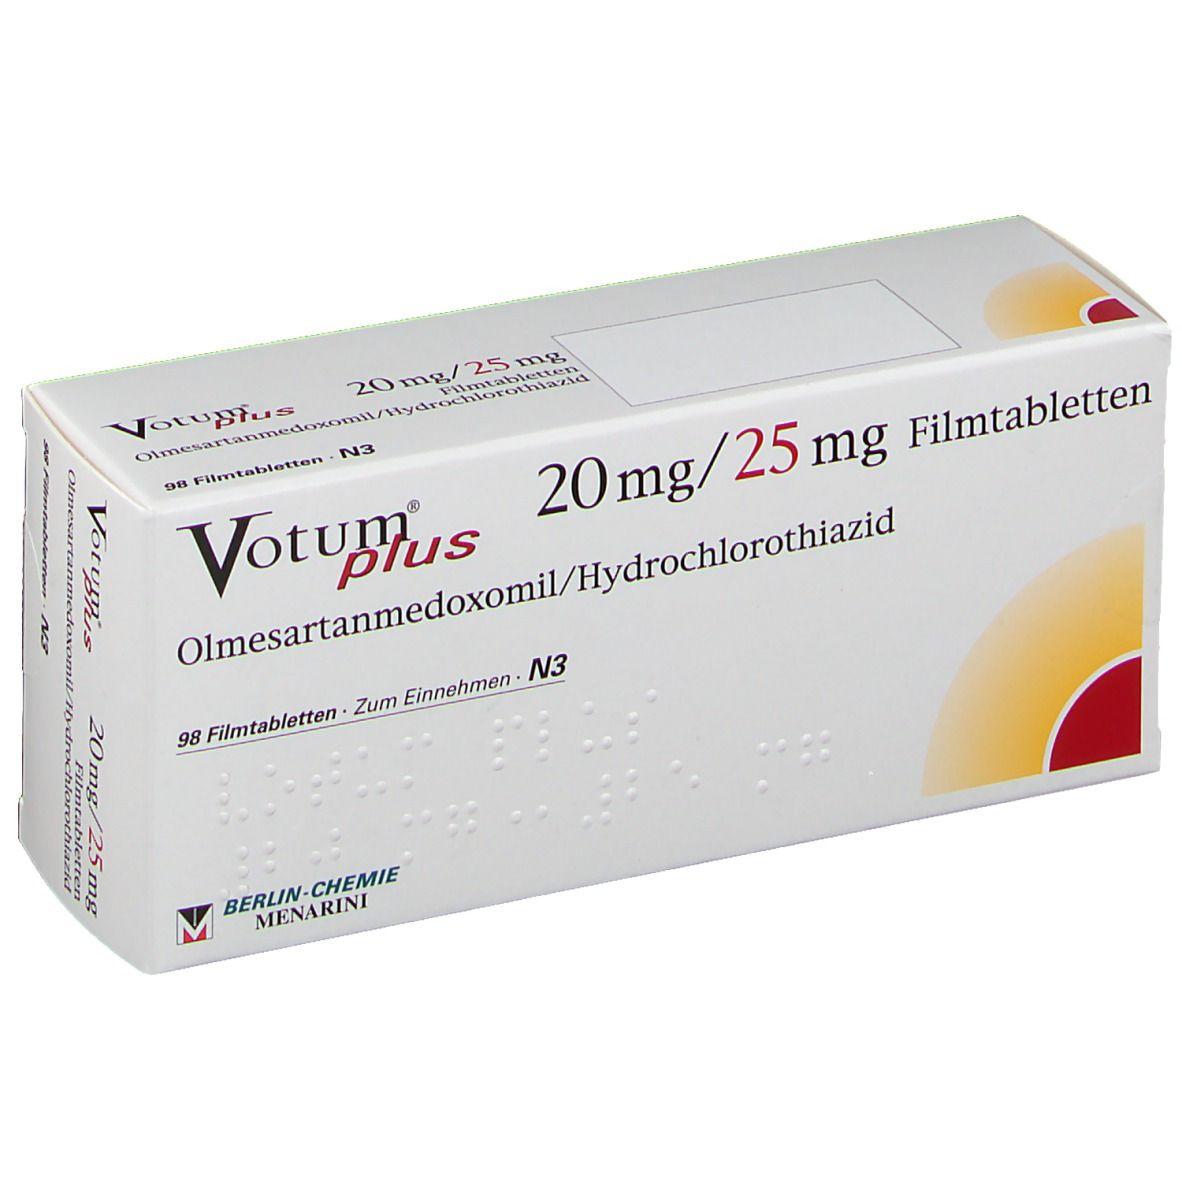 Votum Plus 20 mg/25 mg Filmtabletten